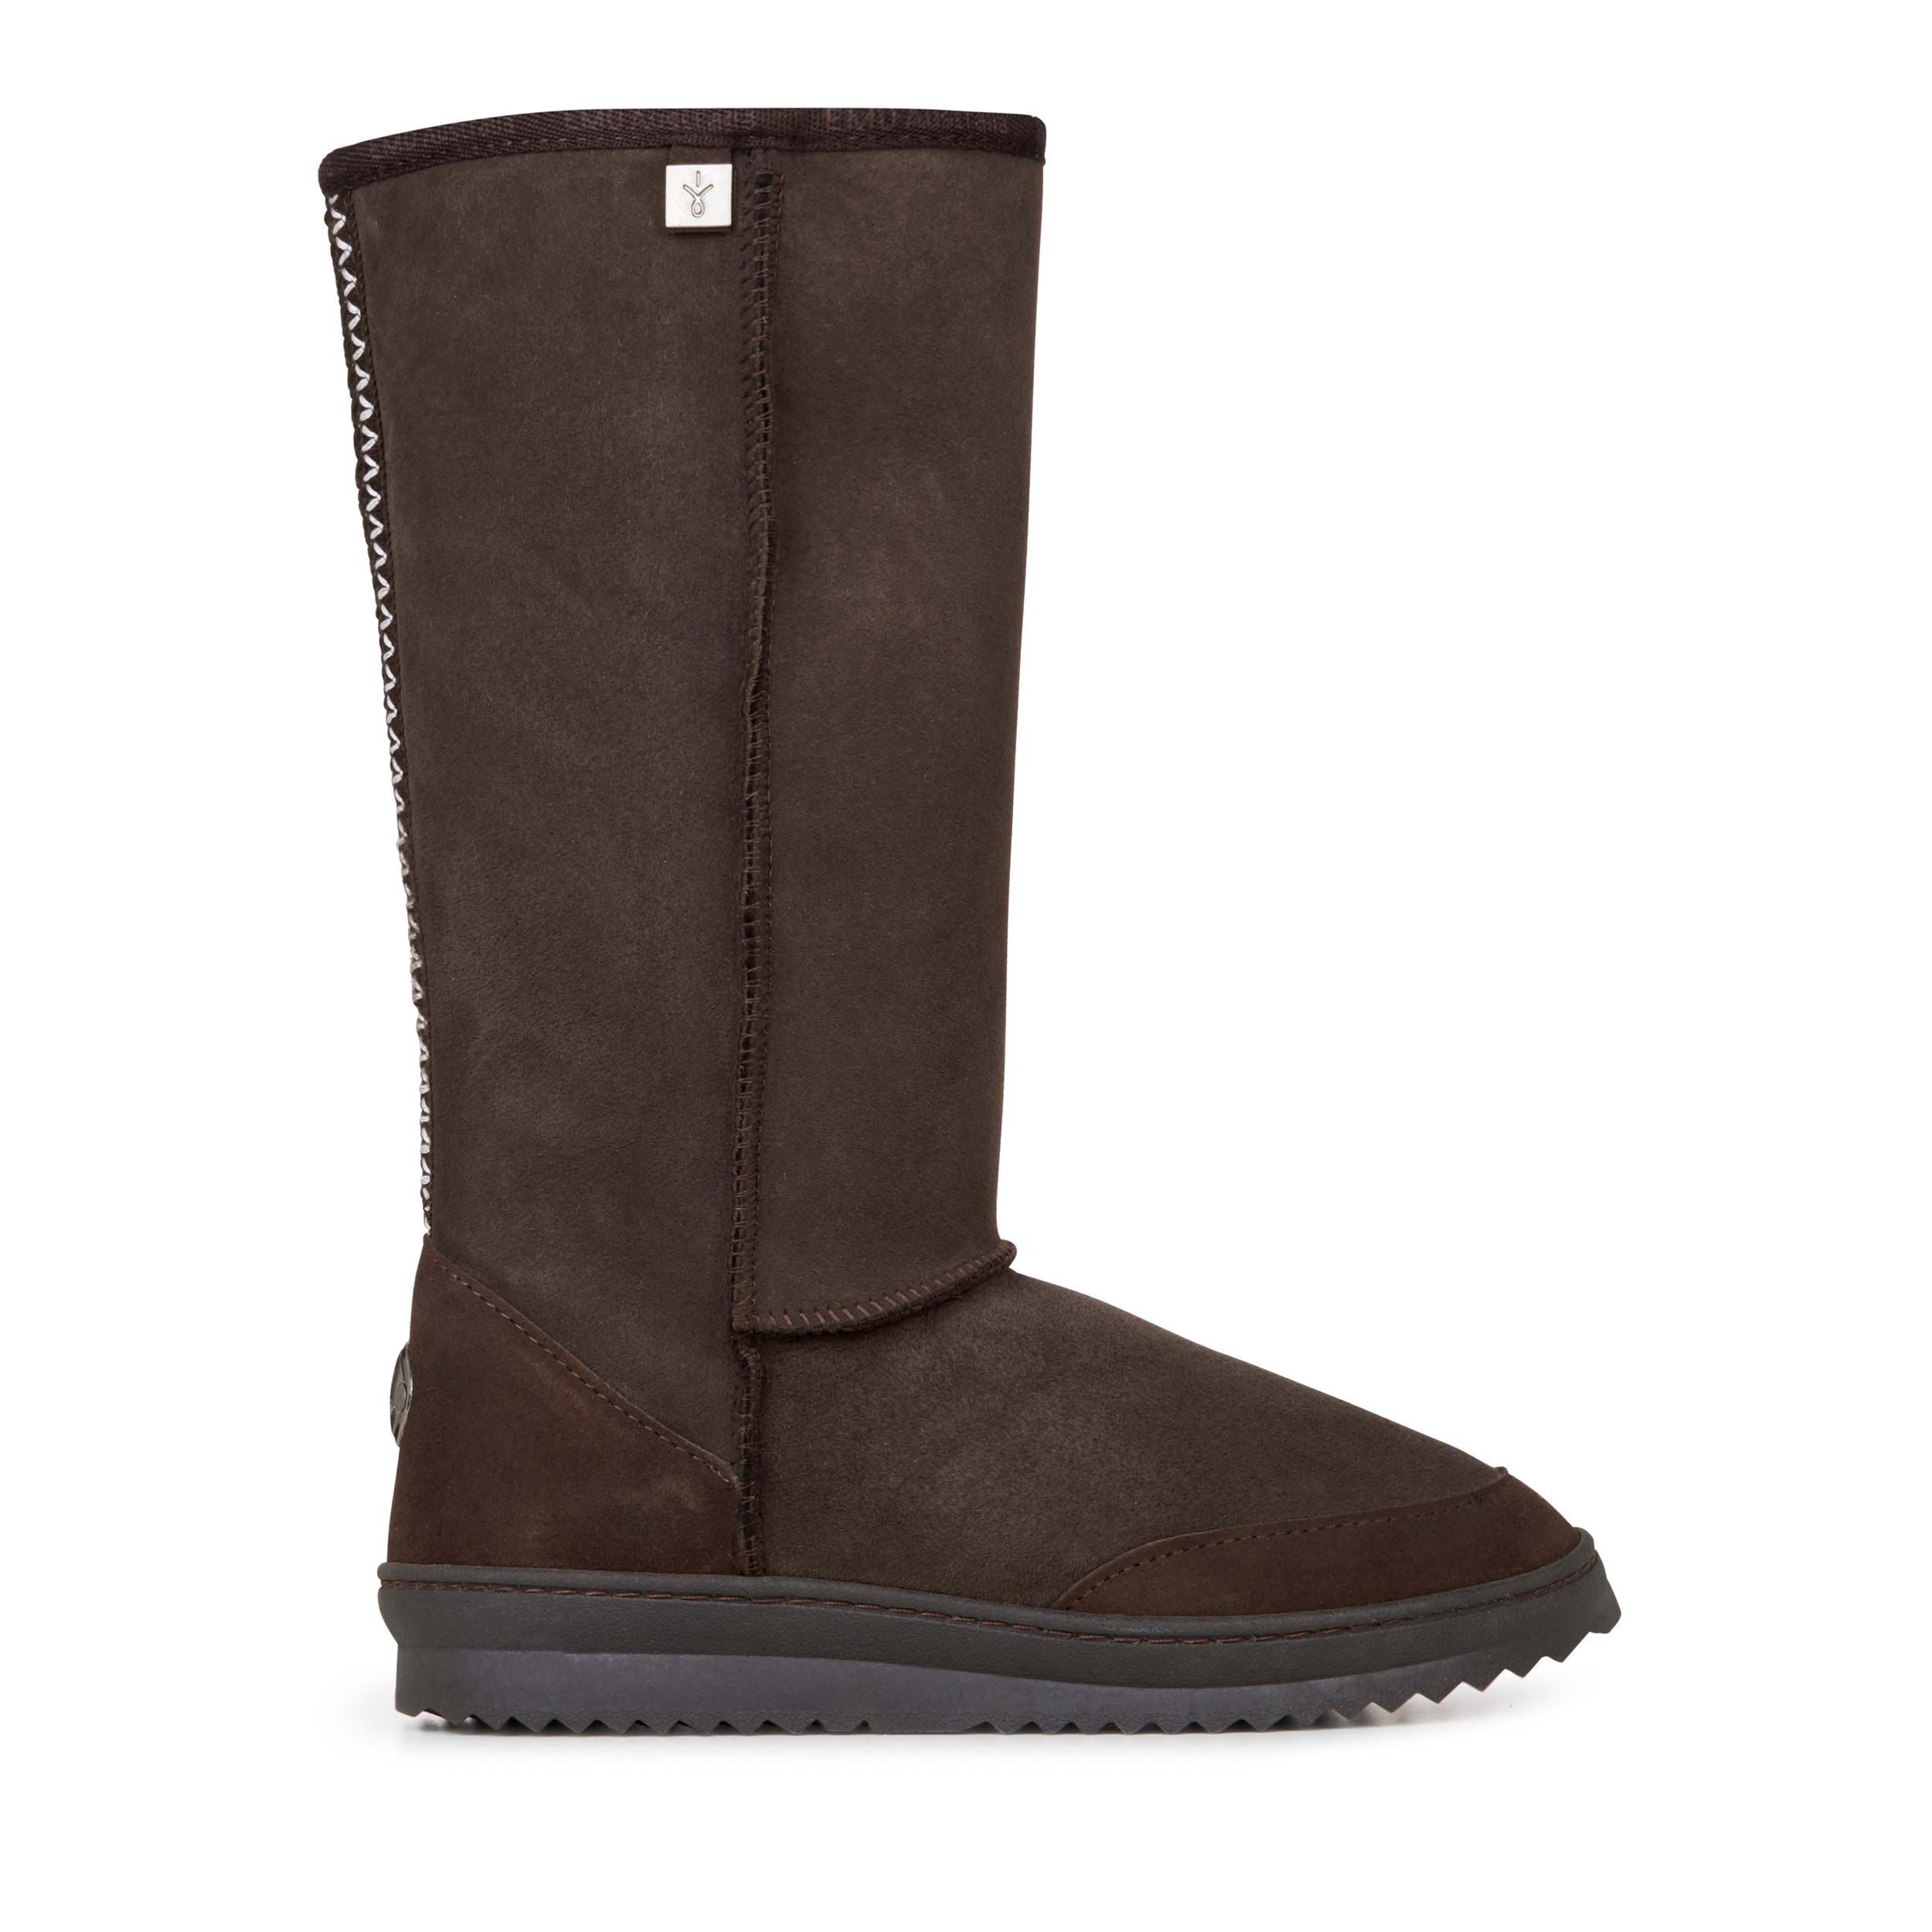 Emu Australia Unisex Brown Bear Boots Kids